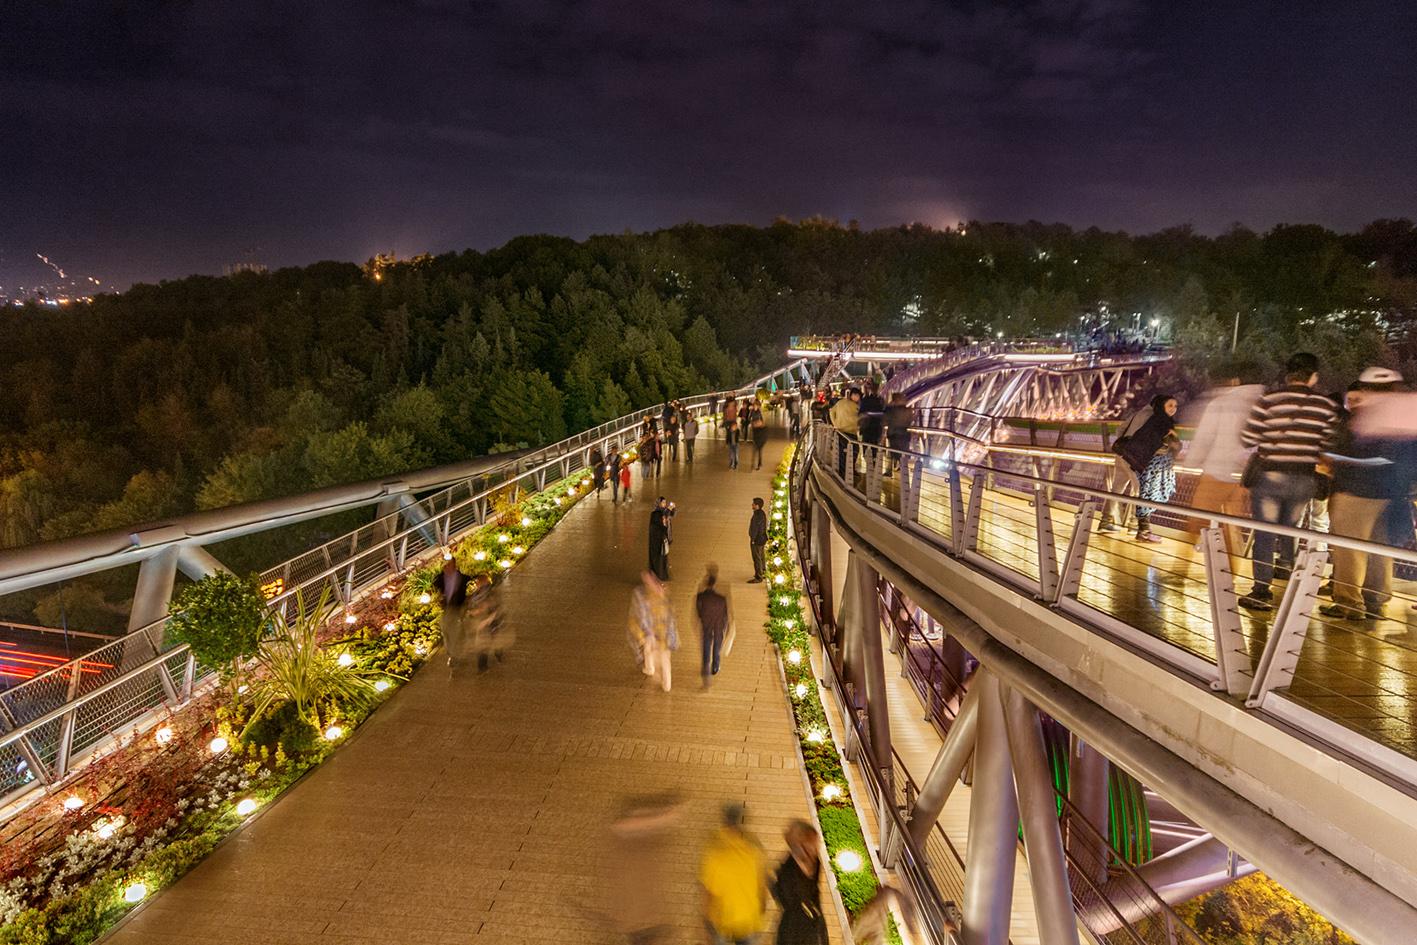 نورپردازی پل طبیعت در شب,محوطه سازی پل طبیعت